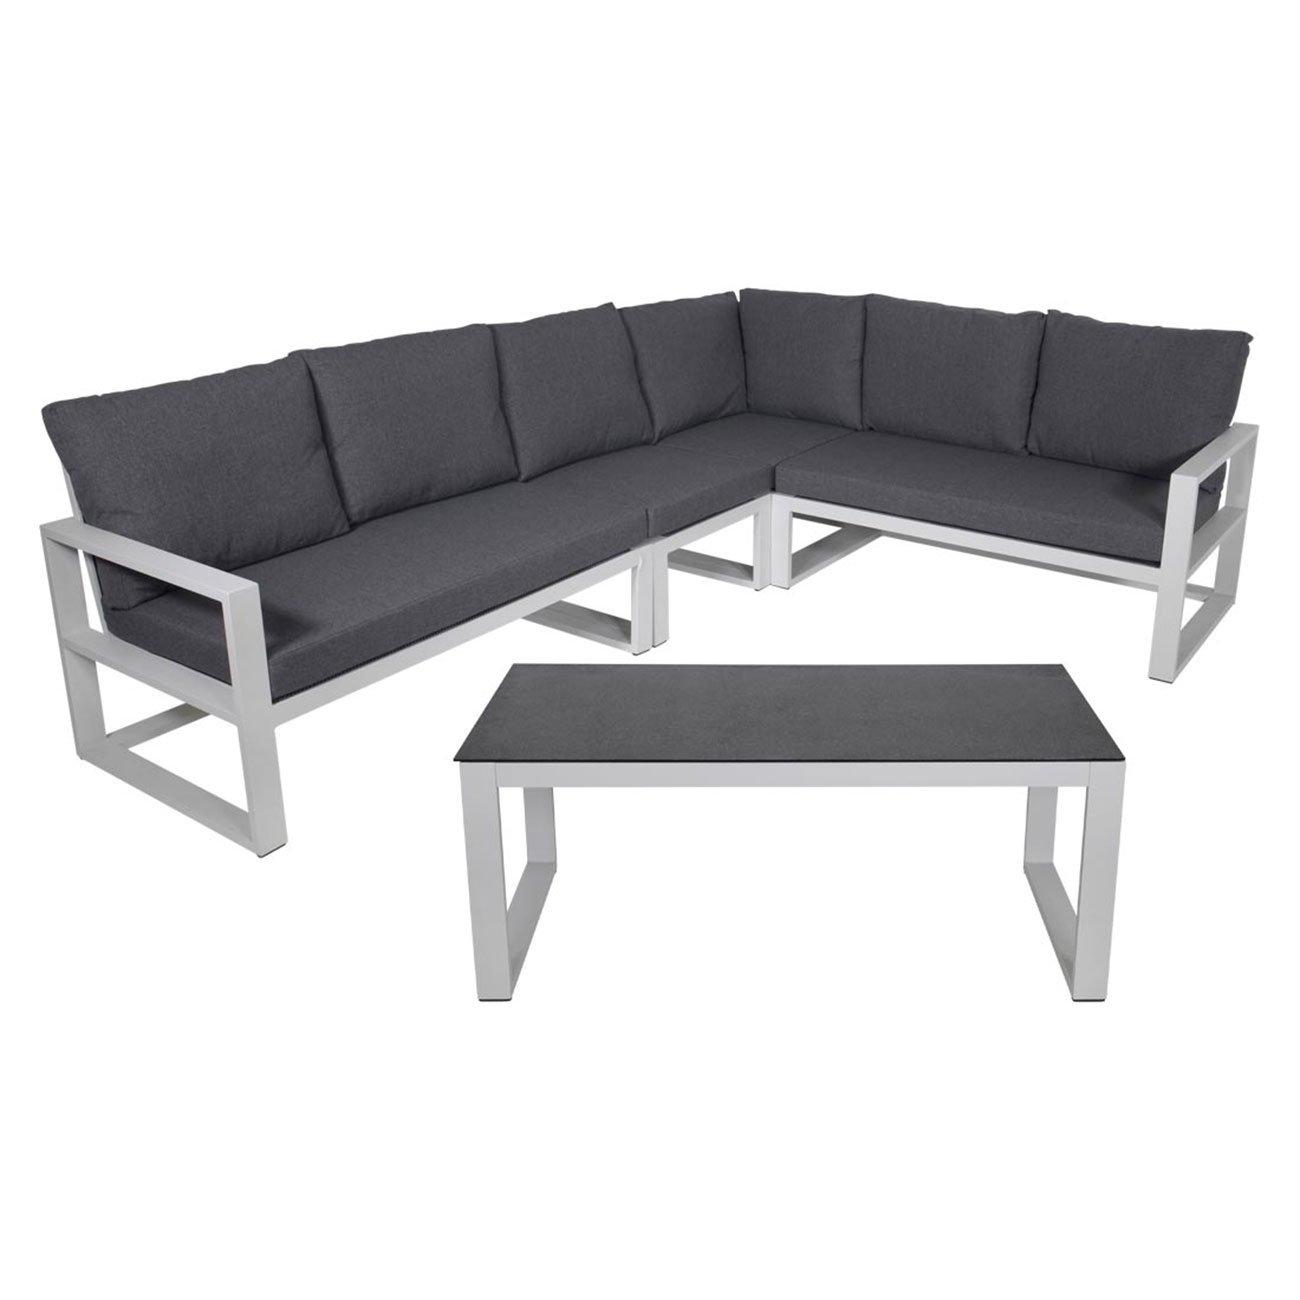 gartenlounge outliv pina colada loungeset 5 teilig aluminium wei grau kissen anthrazit 701259. Black Bedroom Furniture Sets. Home Design Ideas